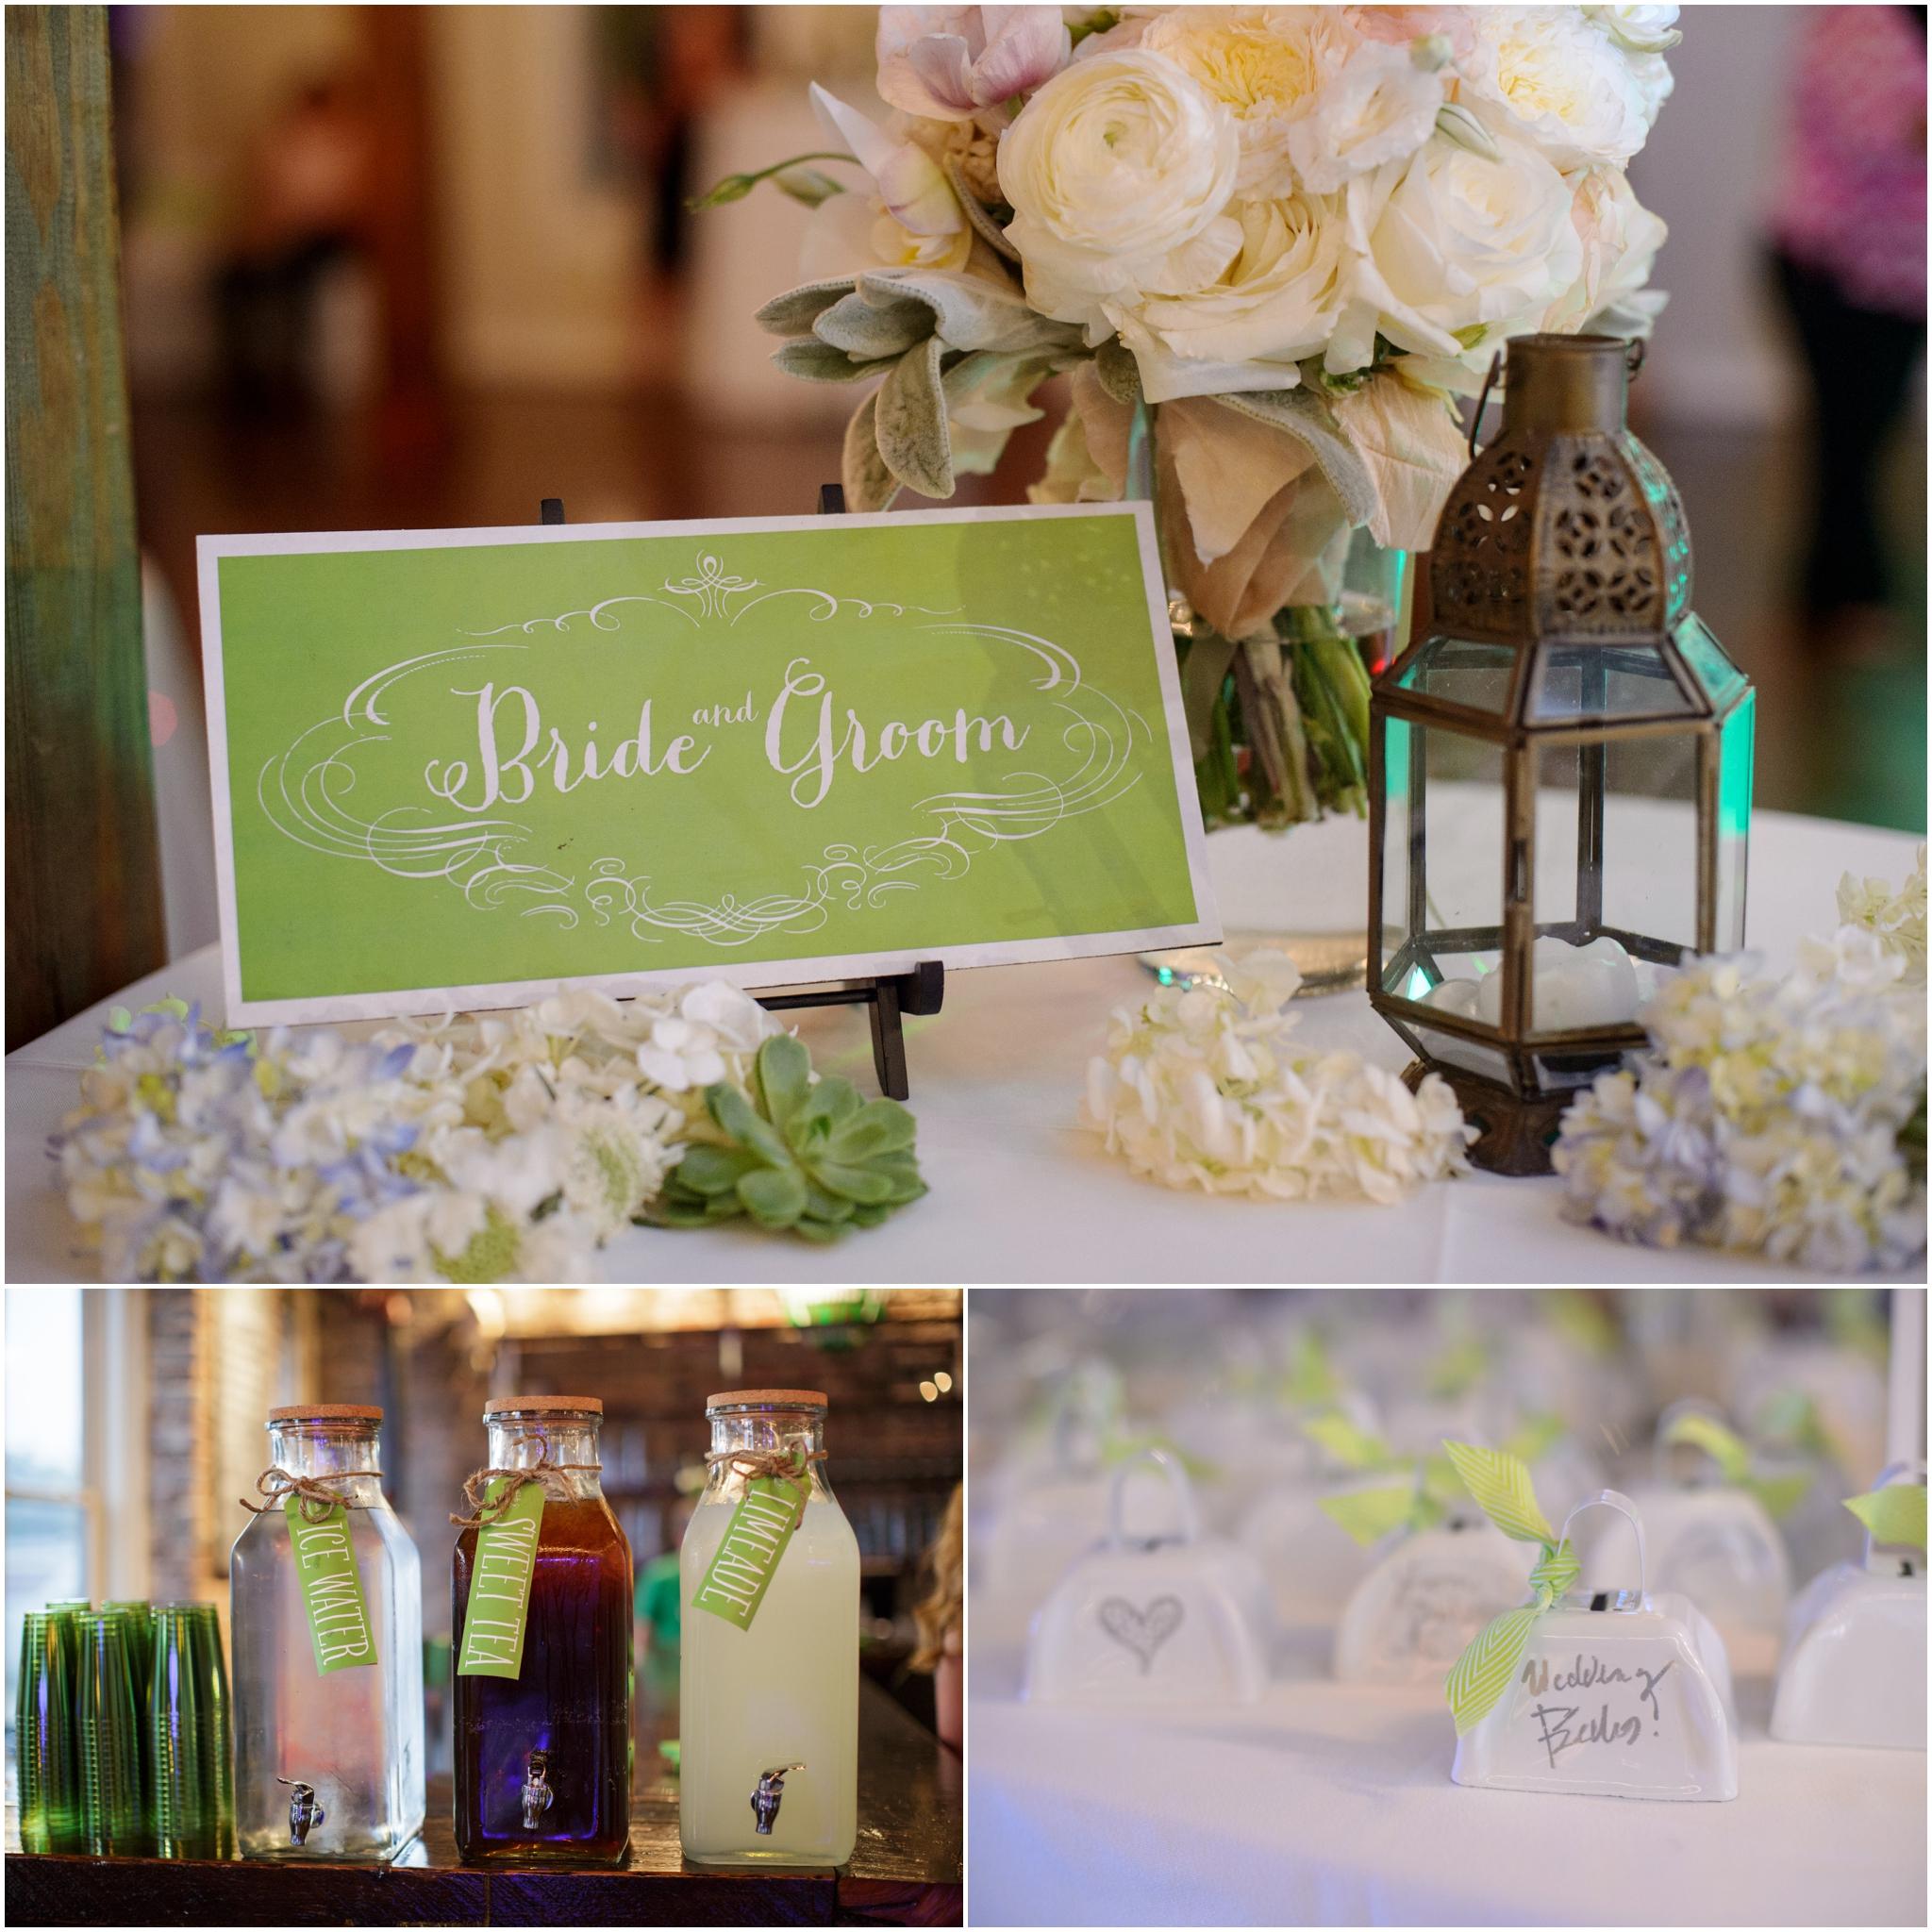 Avondale Birmingham Al: Avondale Brewery Wedding Reception